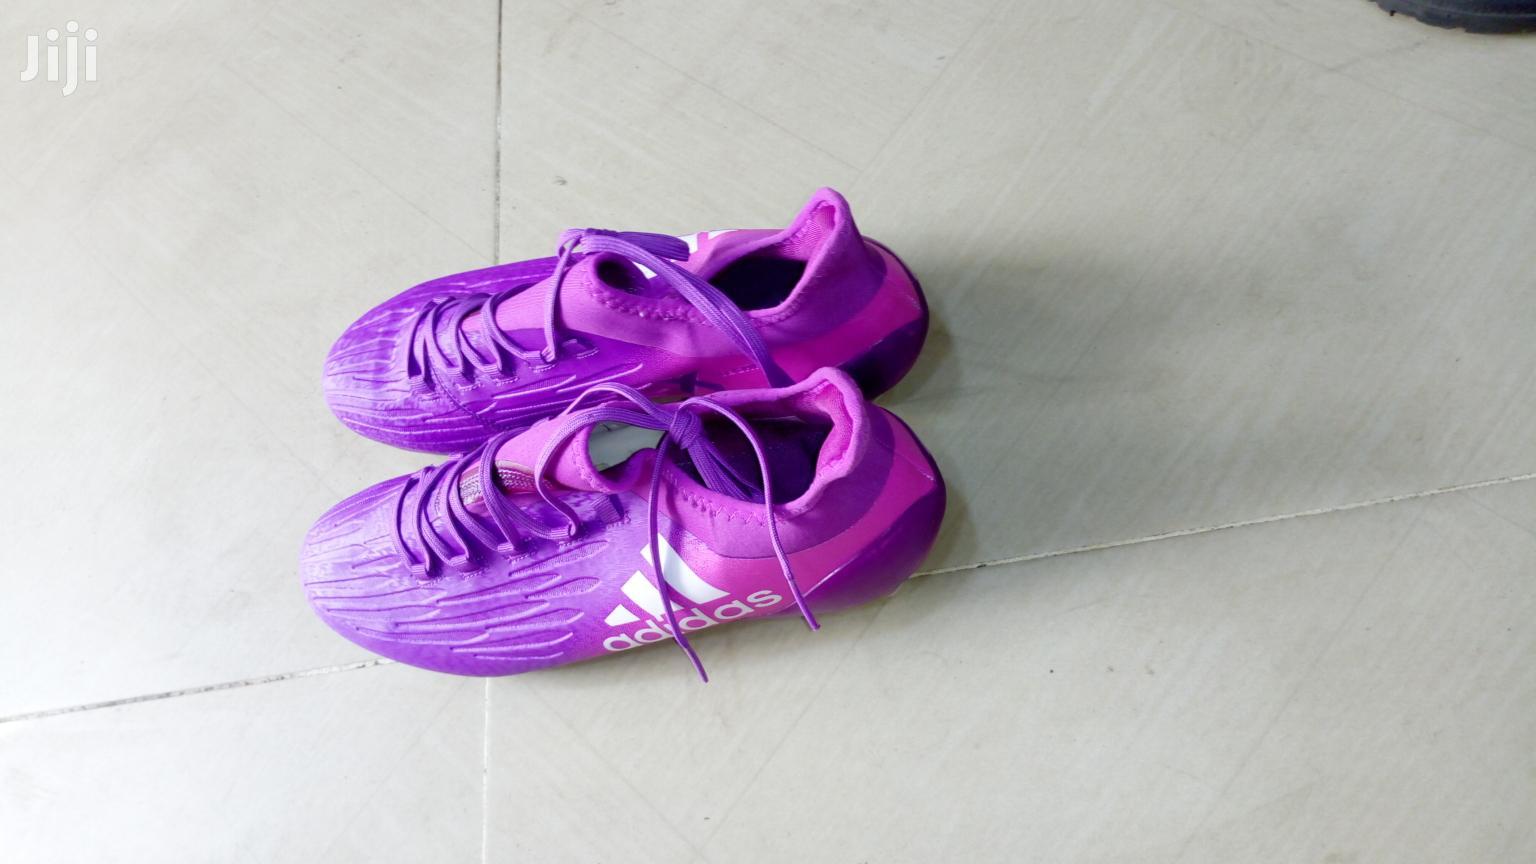 Original Adidas Football Boot   Shoes for sale in Apapa, Lagos State, Nigeria